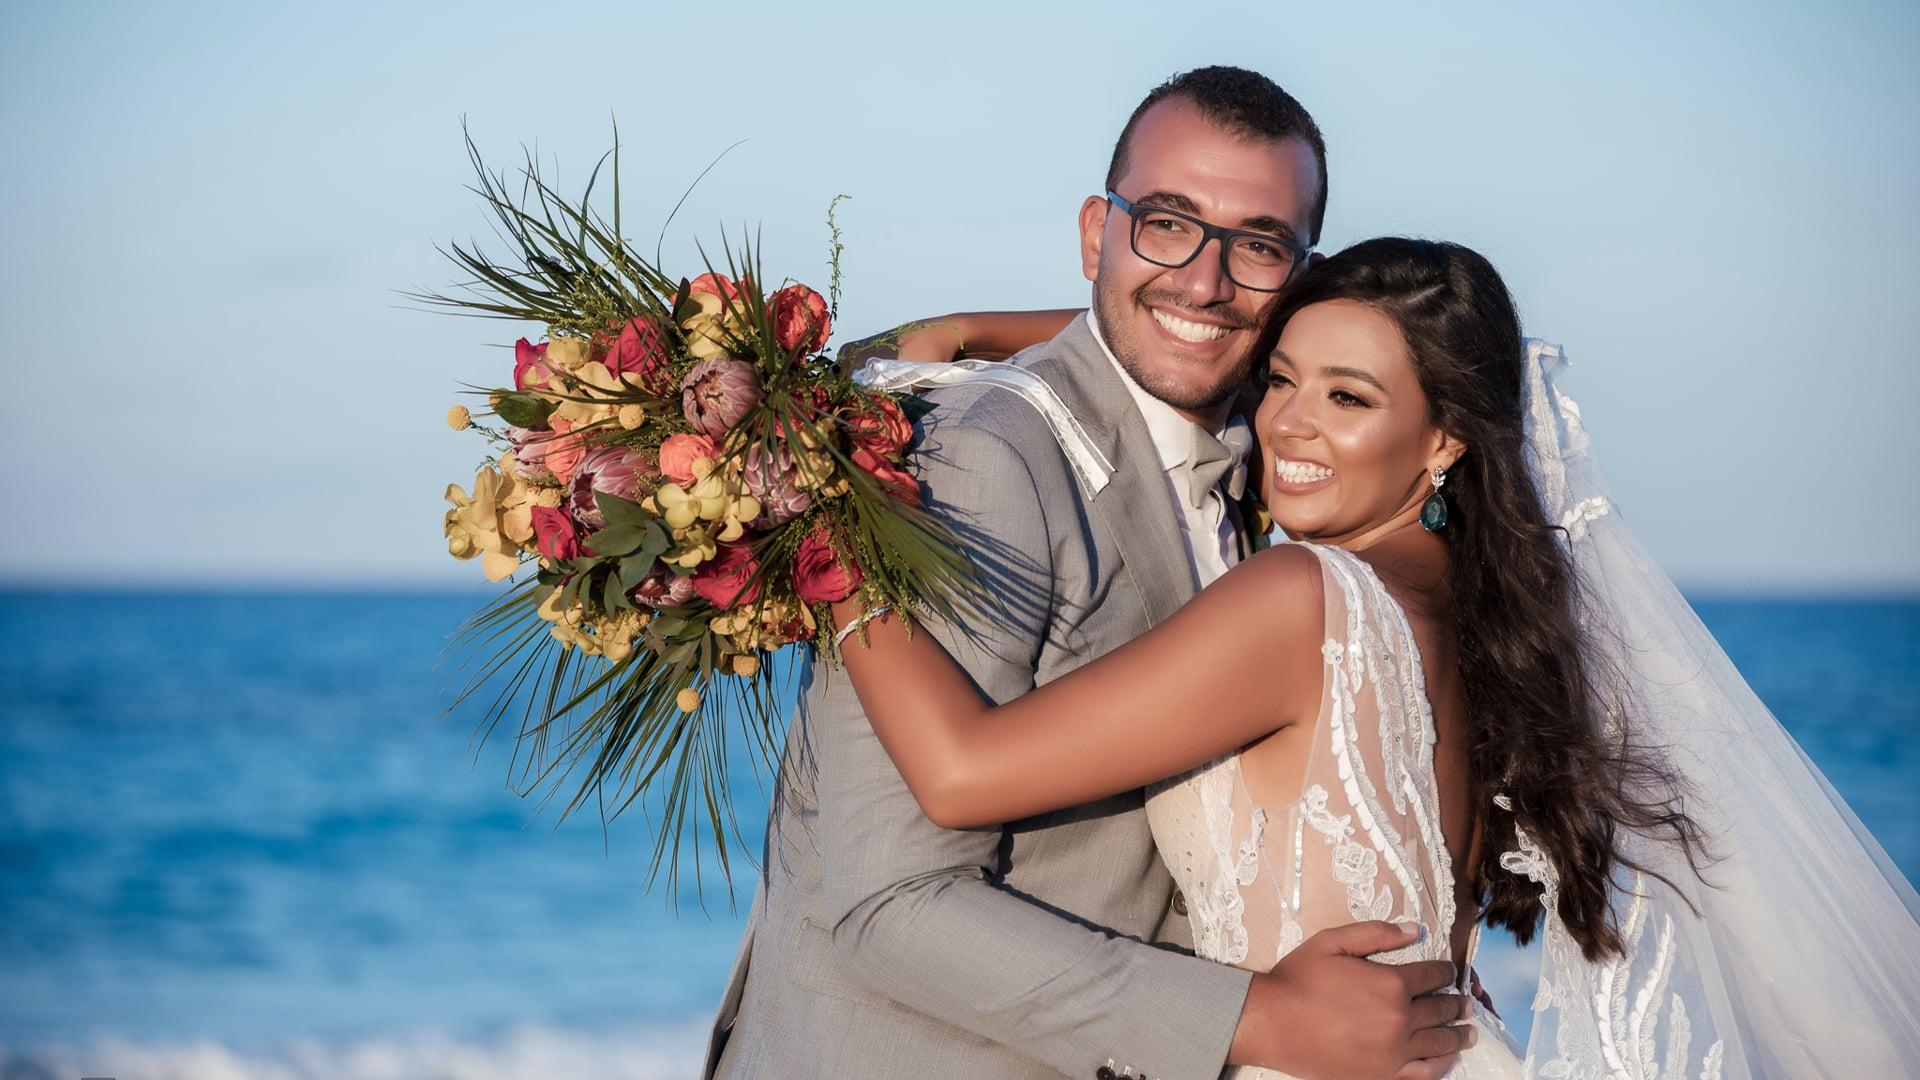 MARIAM & IBRAHIM WEDDING FILM